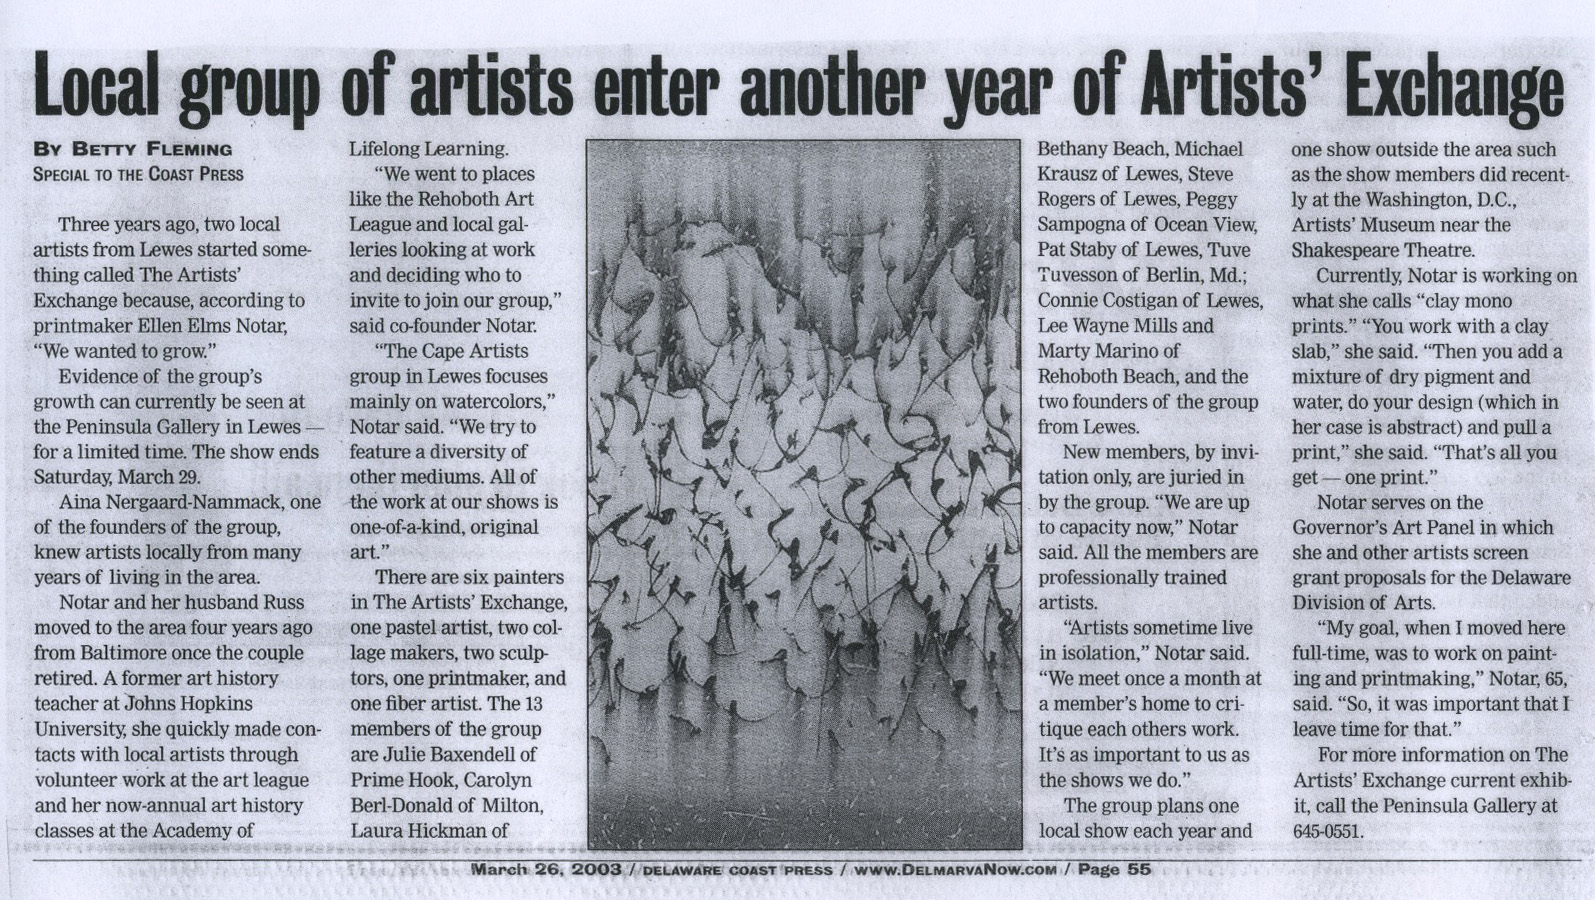 Delaware Coast Press 2003